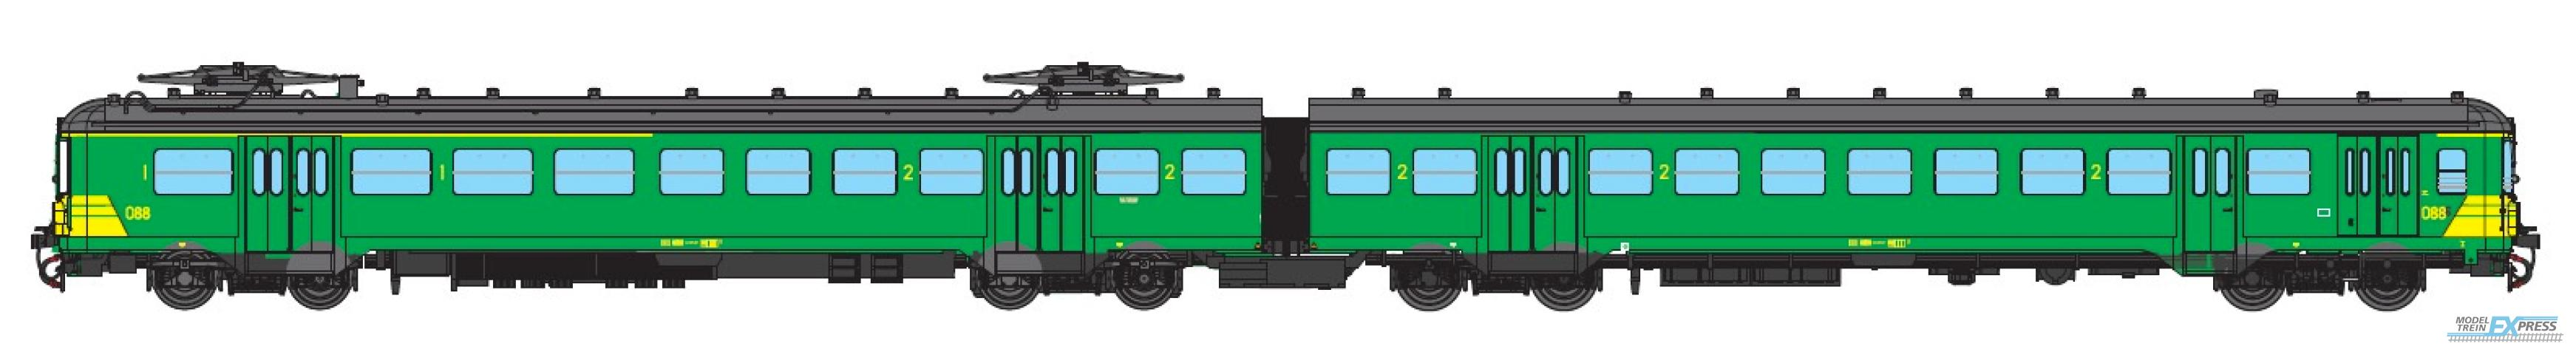 B-Models 7003.05L